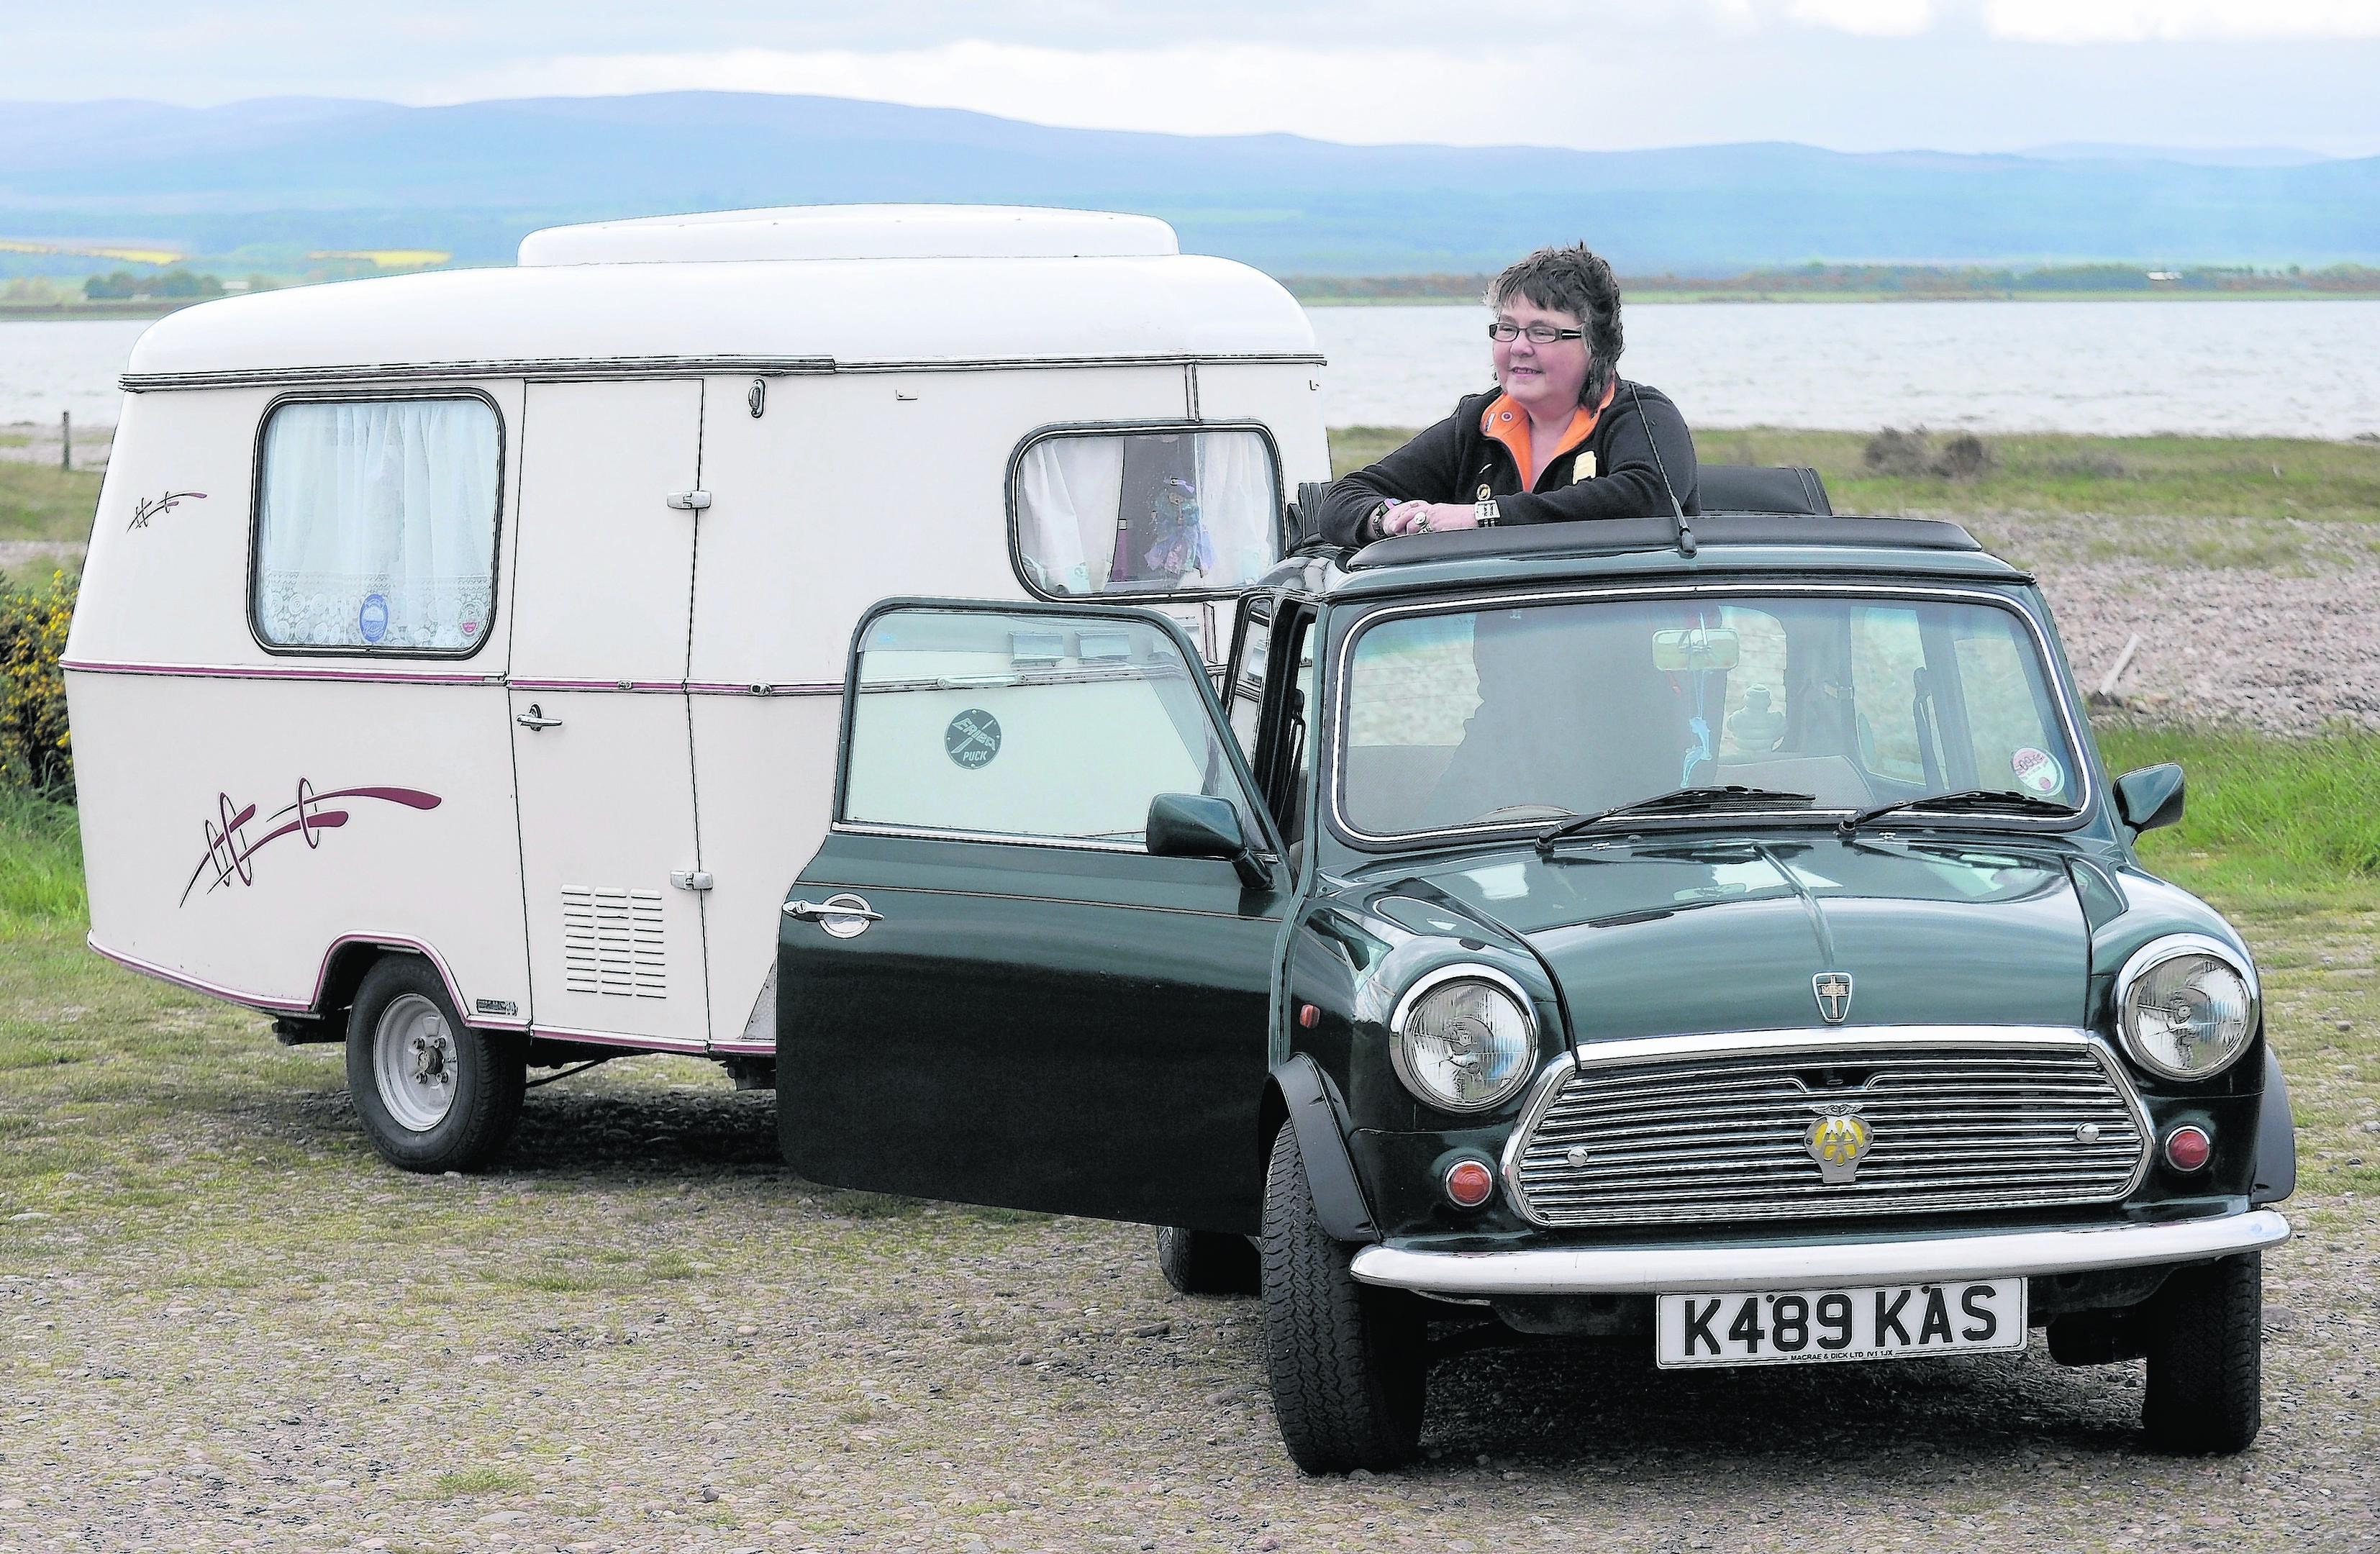 Kerrin Williams of Ardersier with her British Open Classic Mini towing a Eriba Puck caravan.